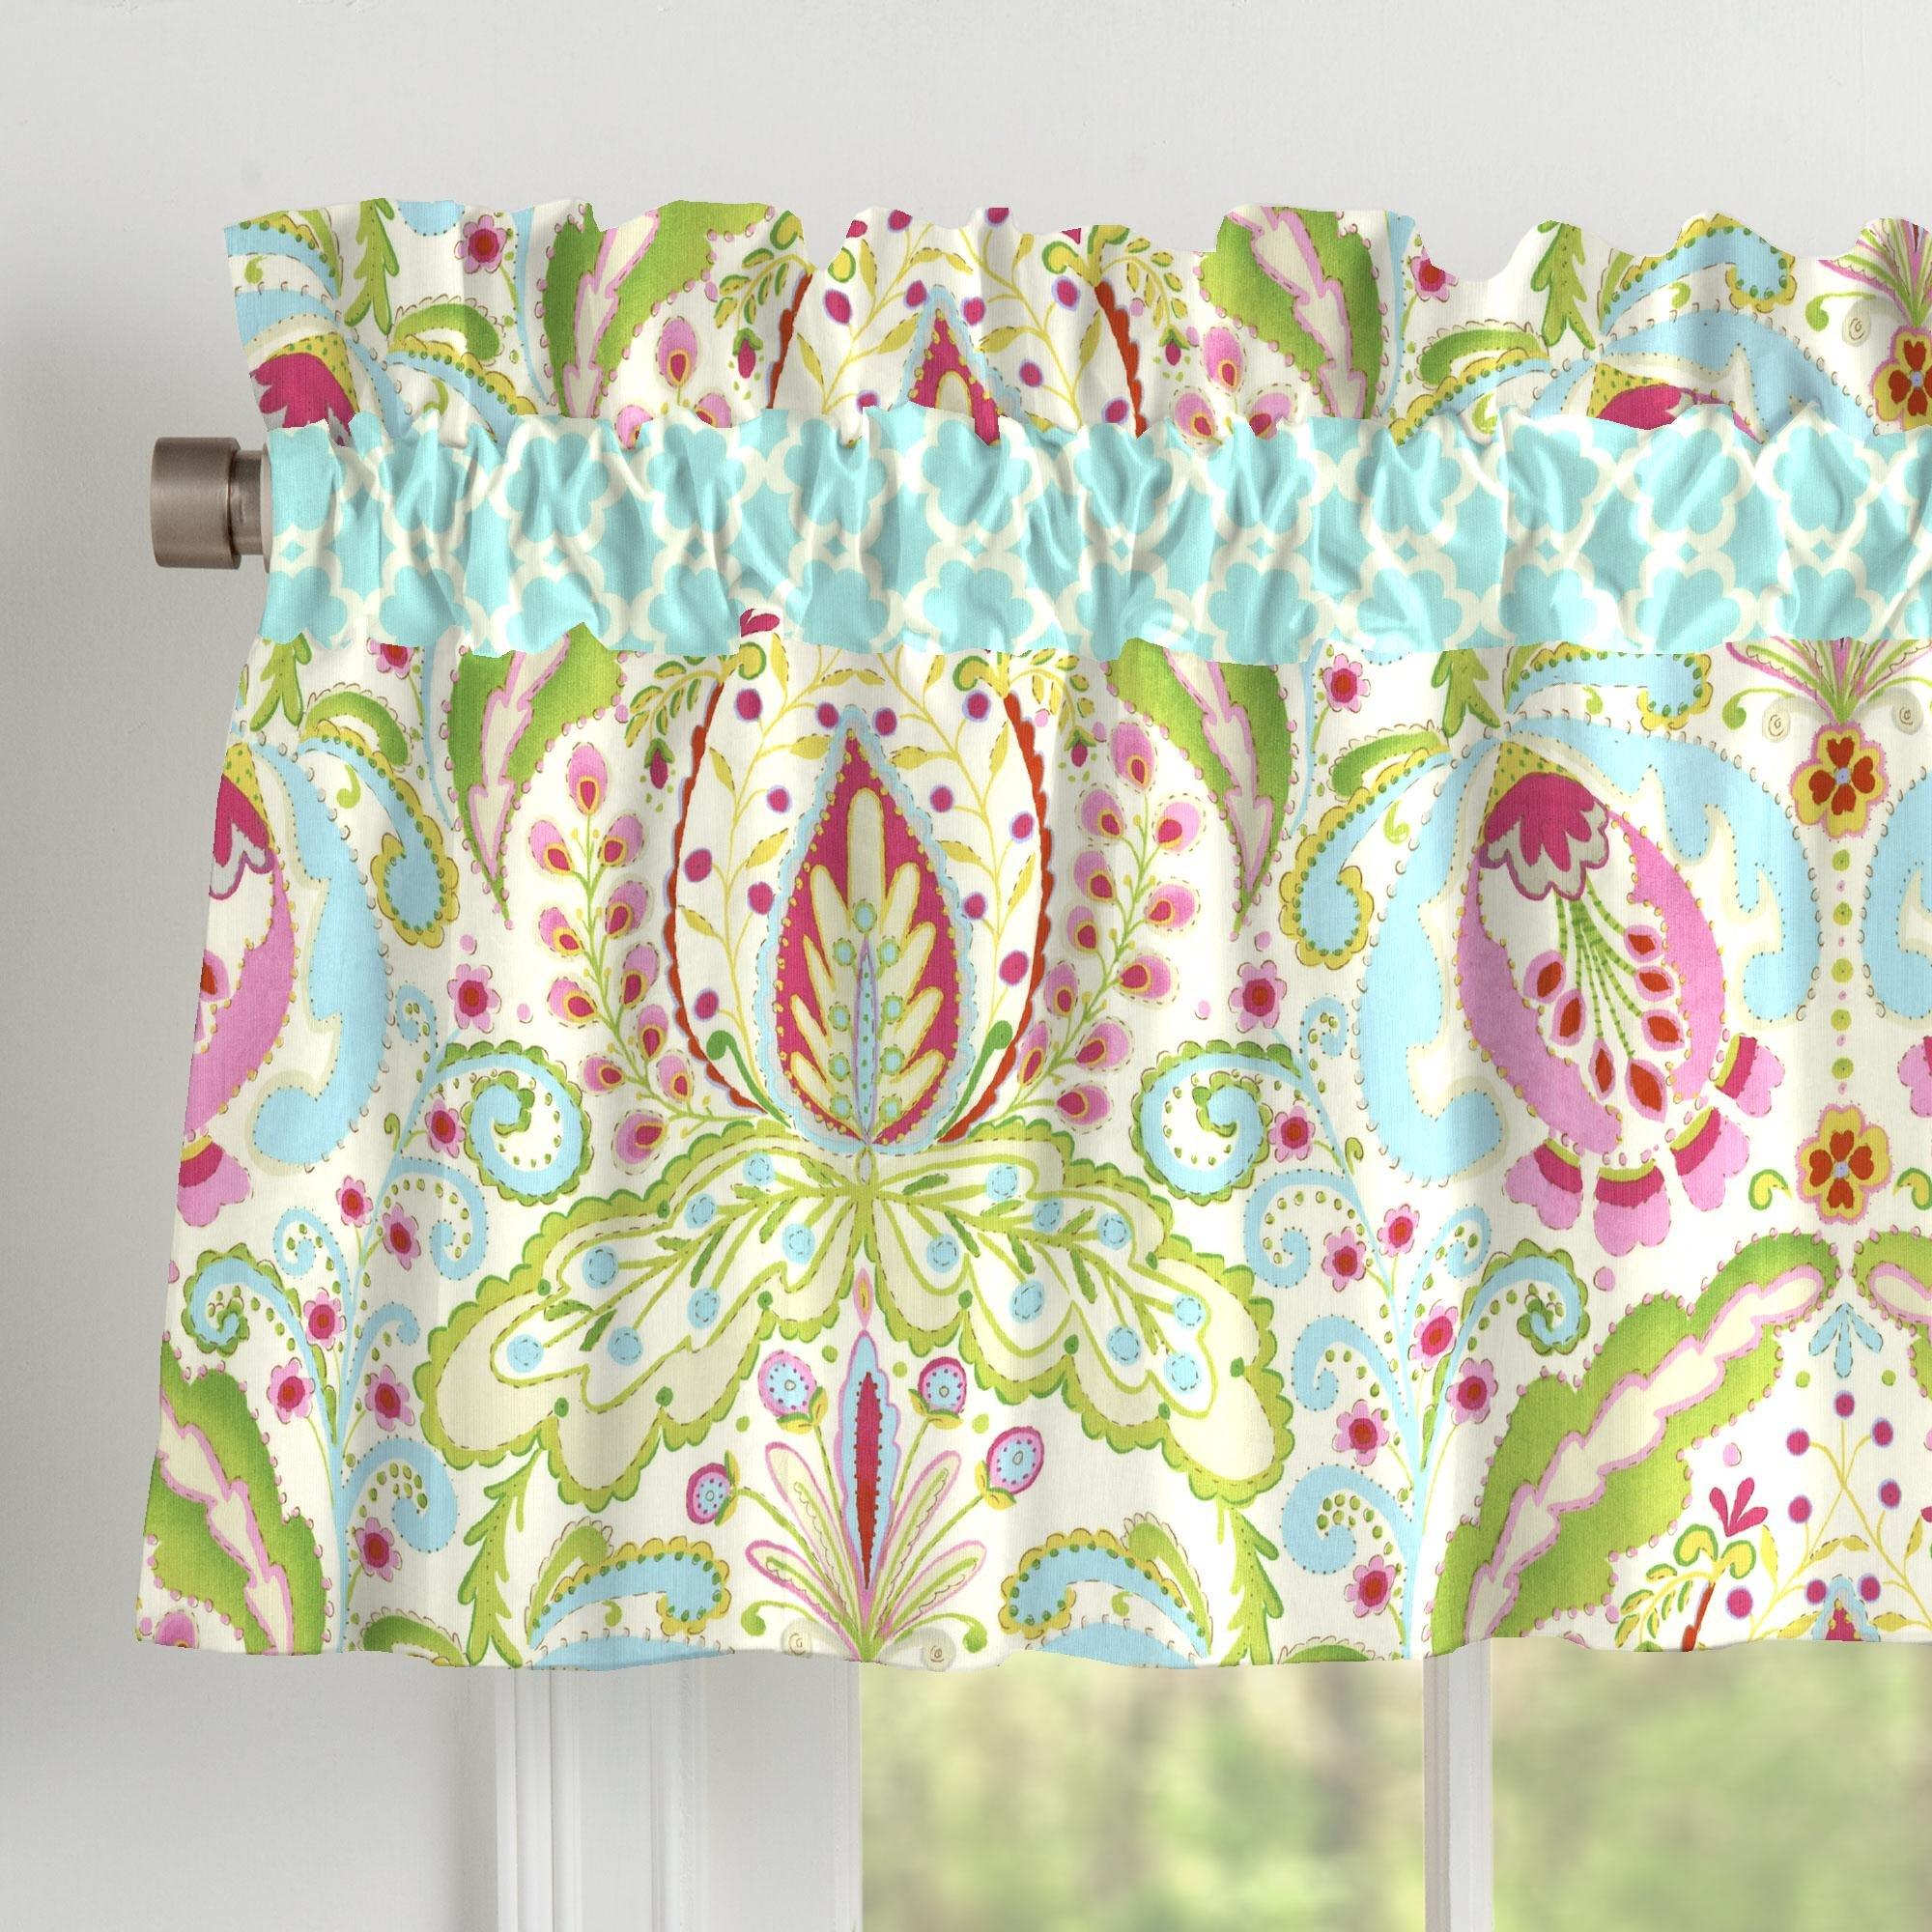 Carousel Designs Kumari Garden Window Valance Rod Pocket by Carousel Designs